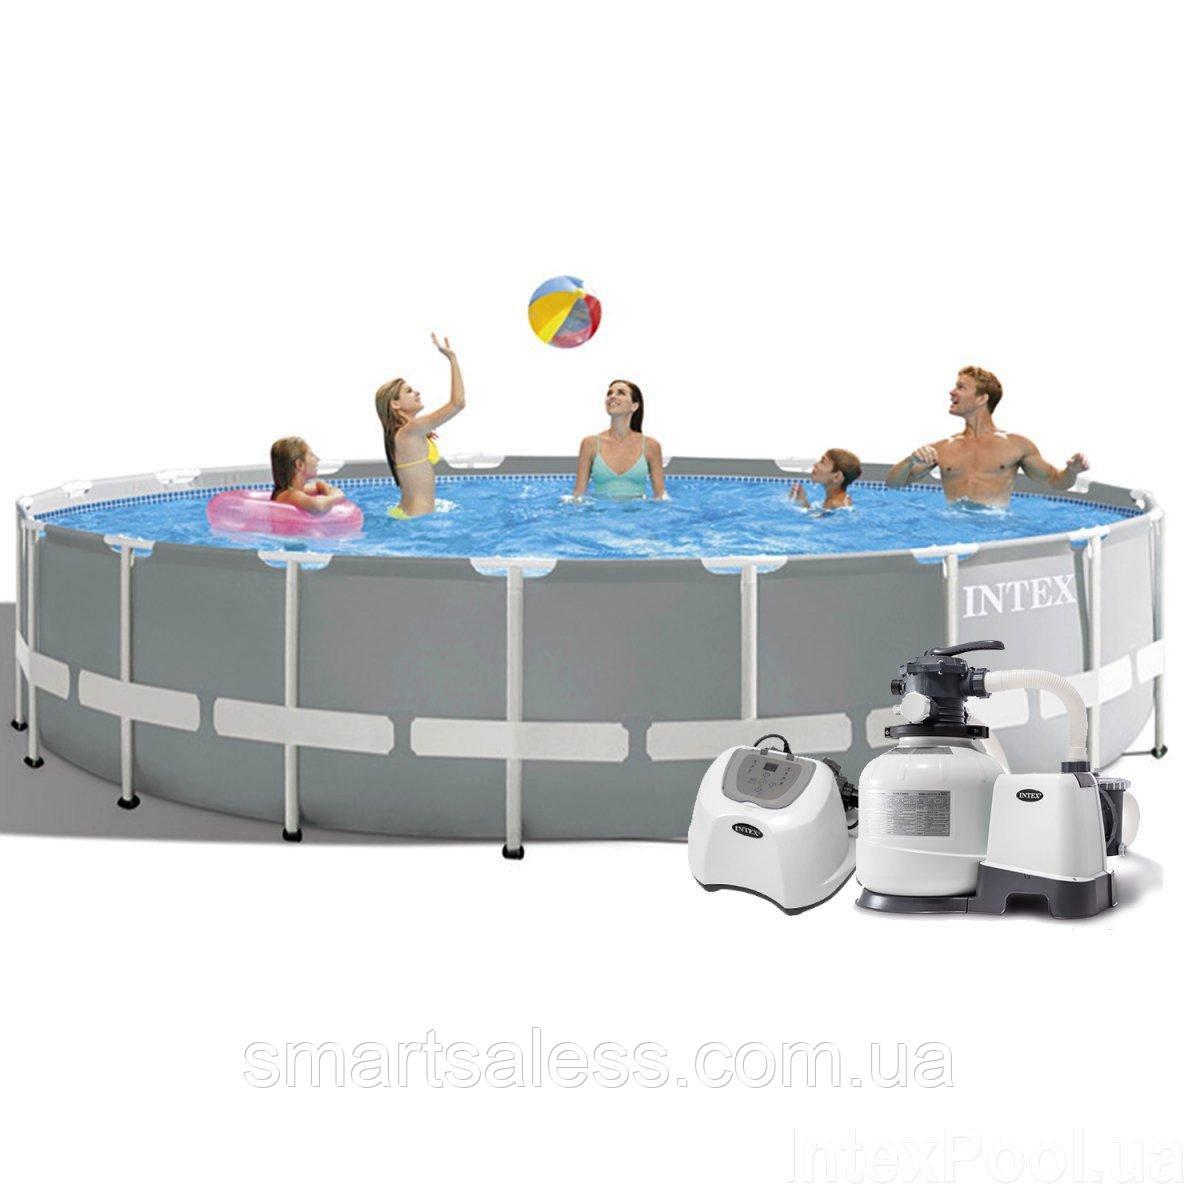 Каркасний басейн Intex, 549 x 122 см, хлор 5 р/год, насос 6 000 л/год, сходи, тент, підстилка, набір